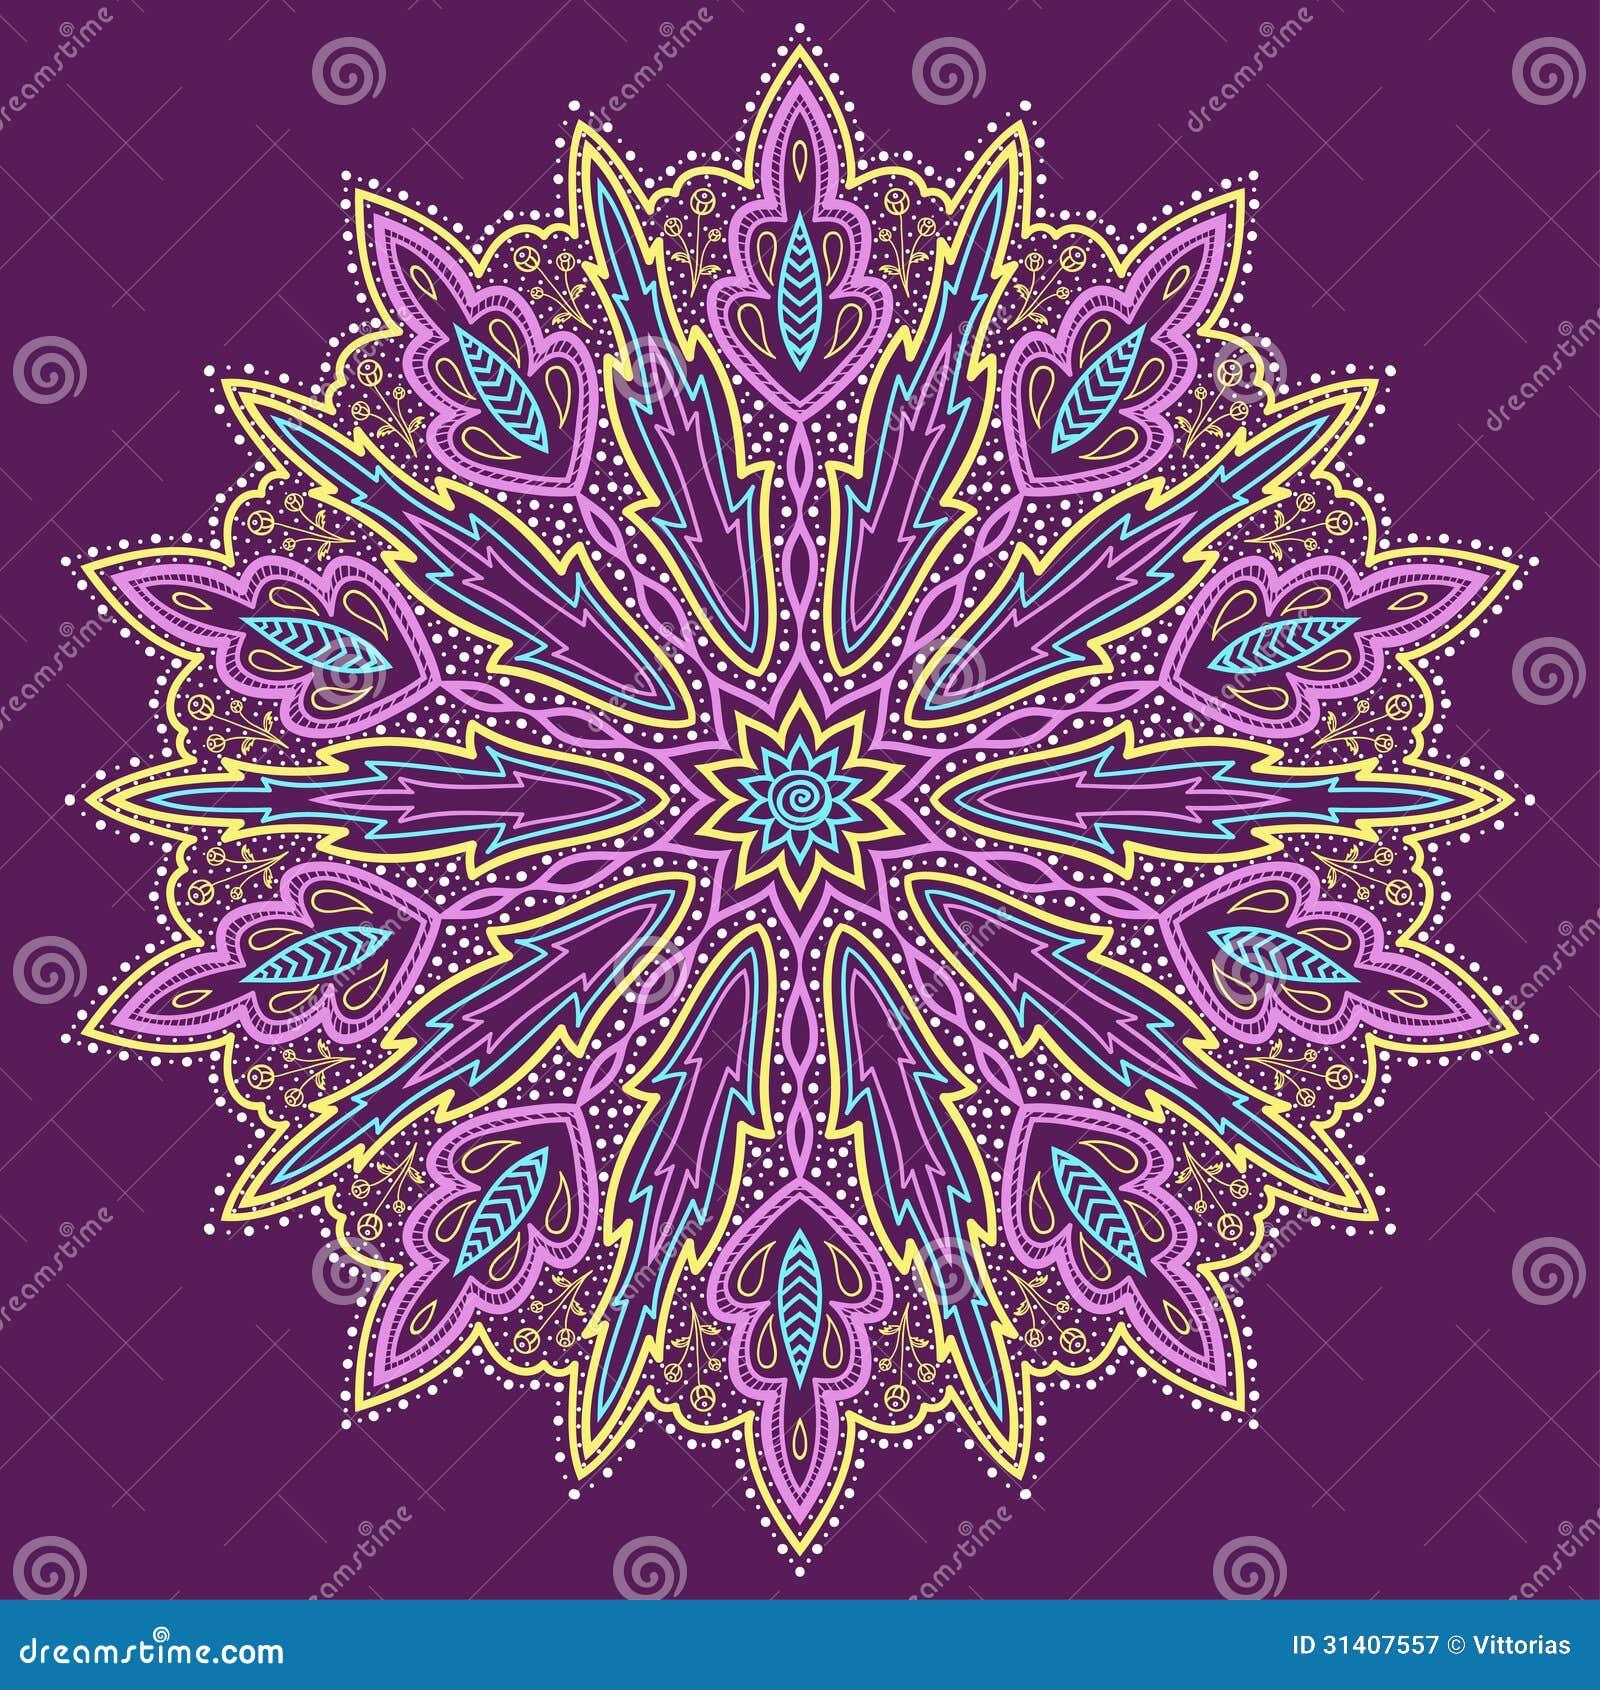 Mandala. Mooie Hand-drawn Bloem. Violette Achtergrond. Royalty-vrije ...: nl.dreamstime.com/royalty-vrije-stock-fotografie-mandala-mooie-hand...